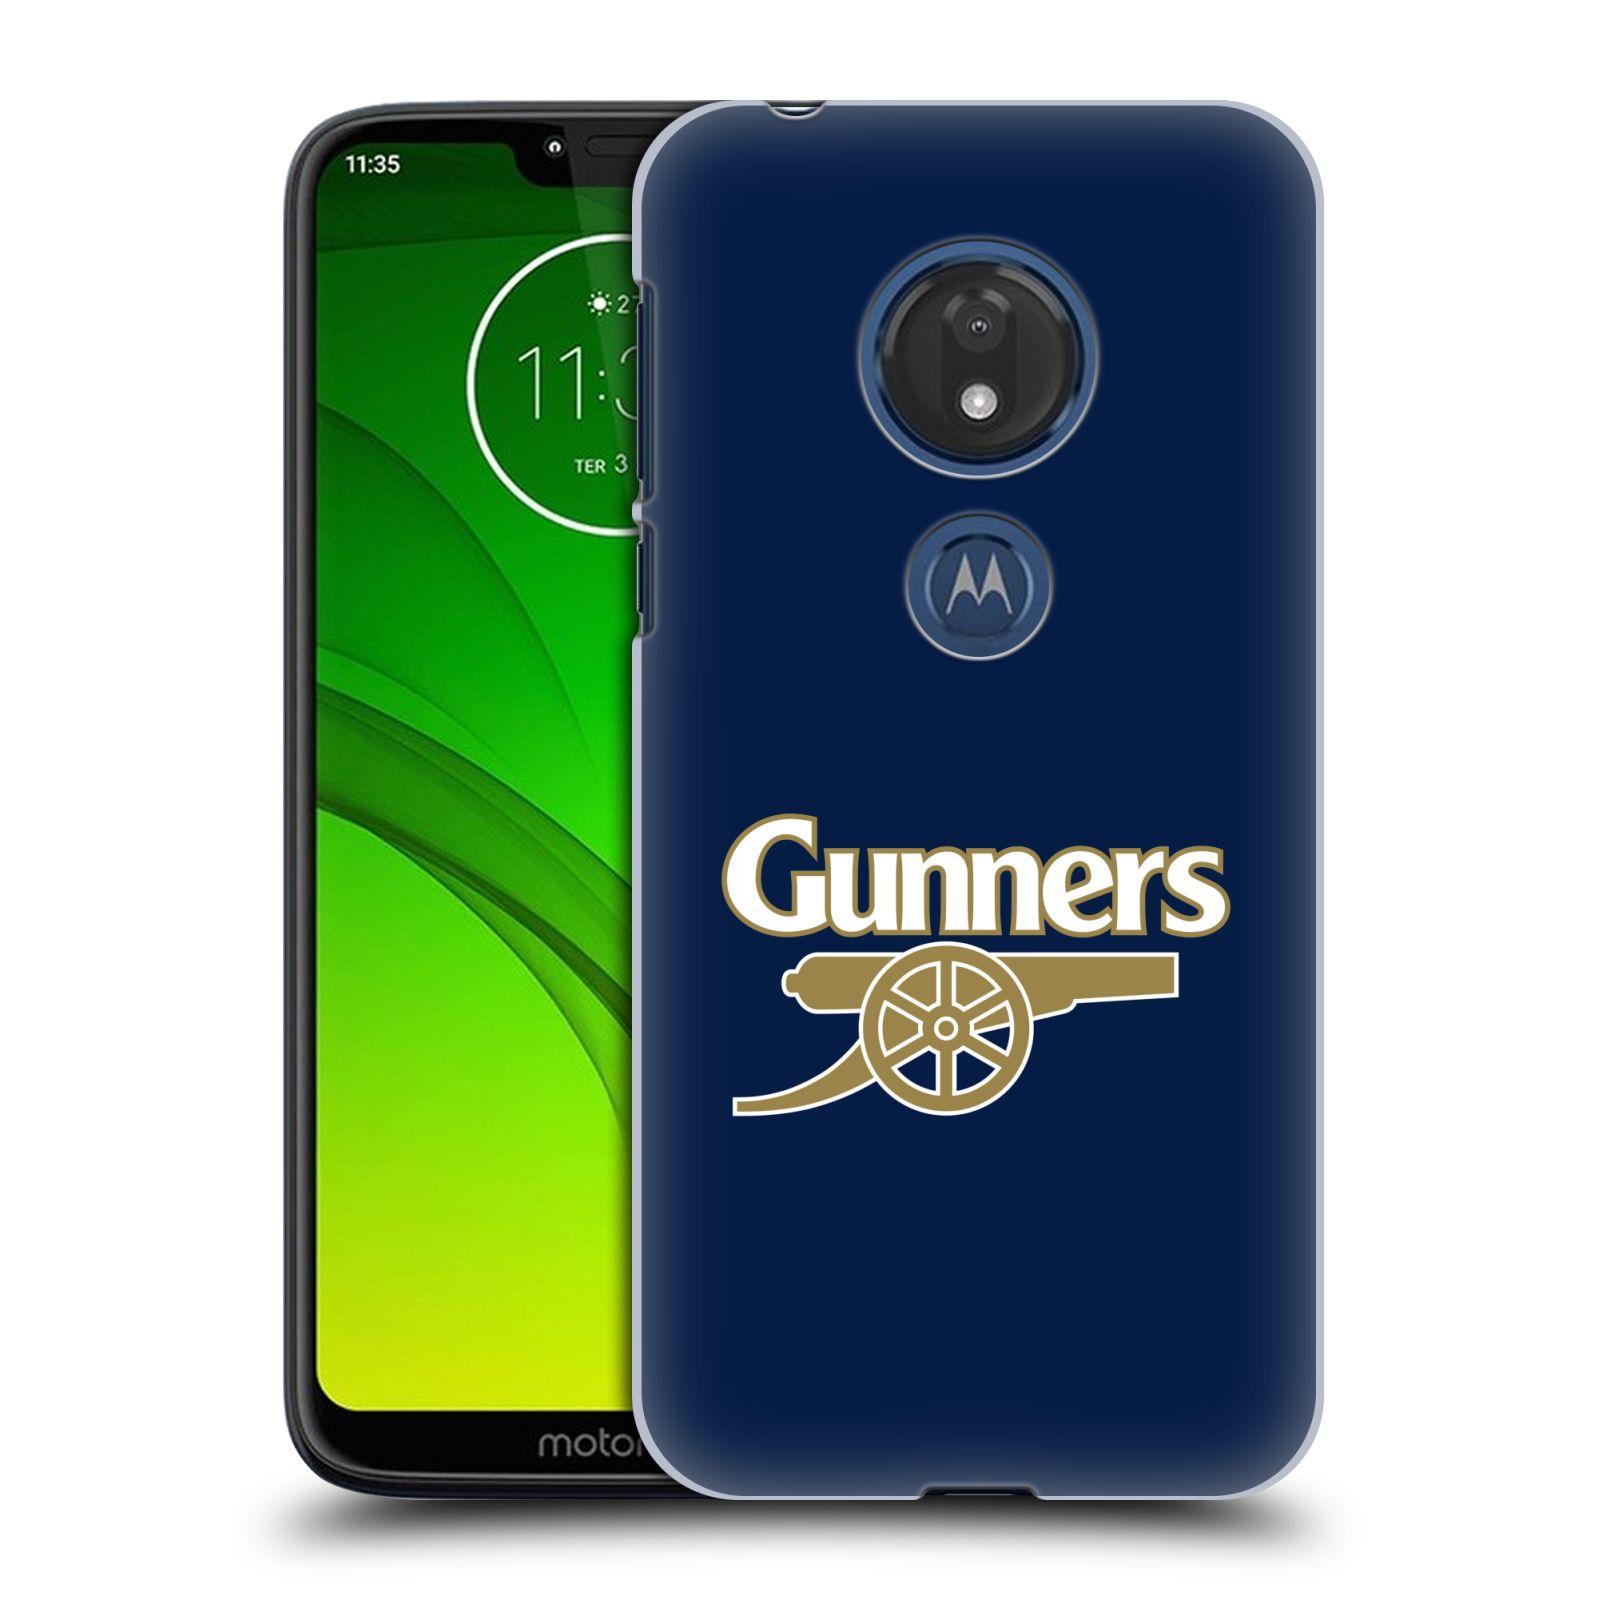 Plastové pouzdro na mobil Motorola Moto G7 Play - Head Case - Arsenal FC - Gunners